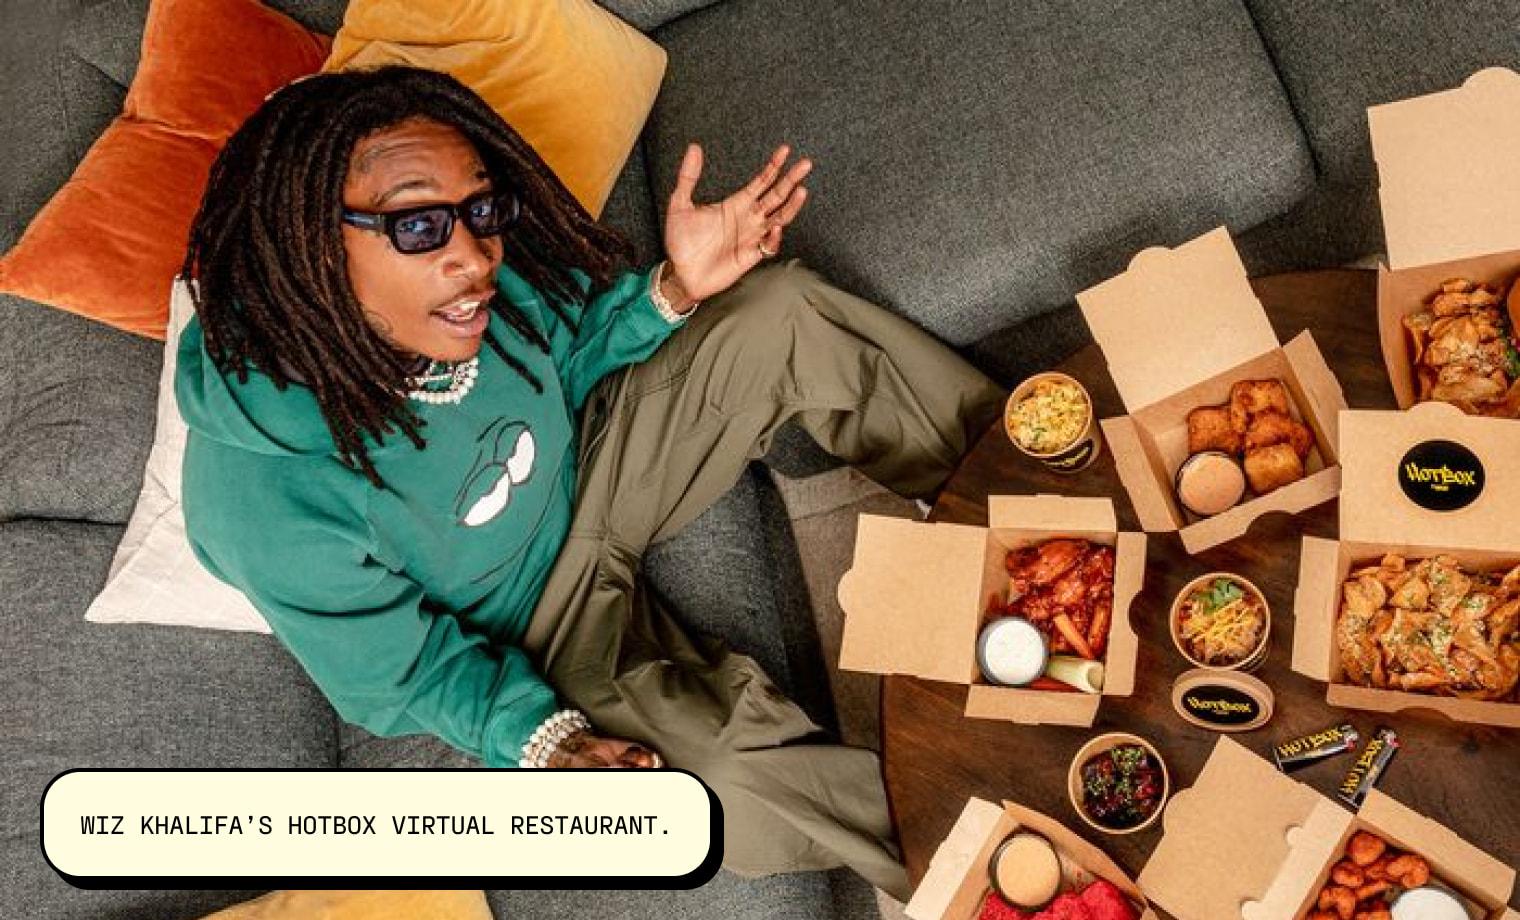 Wiz Khalifa's HotBox virtual restaurant.